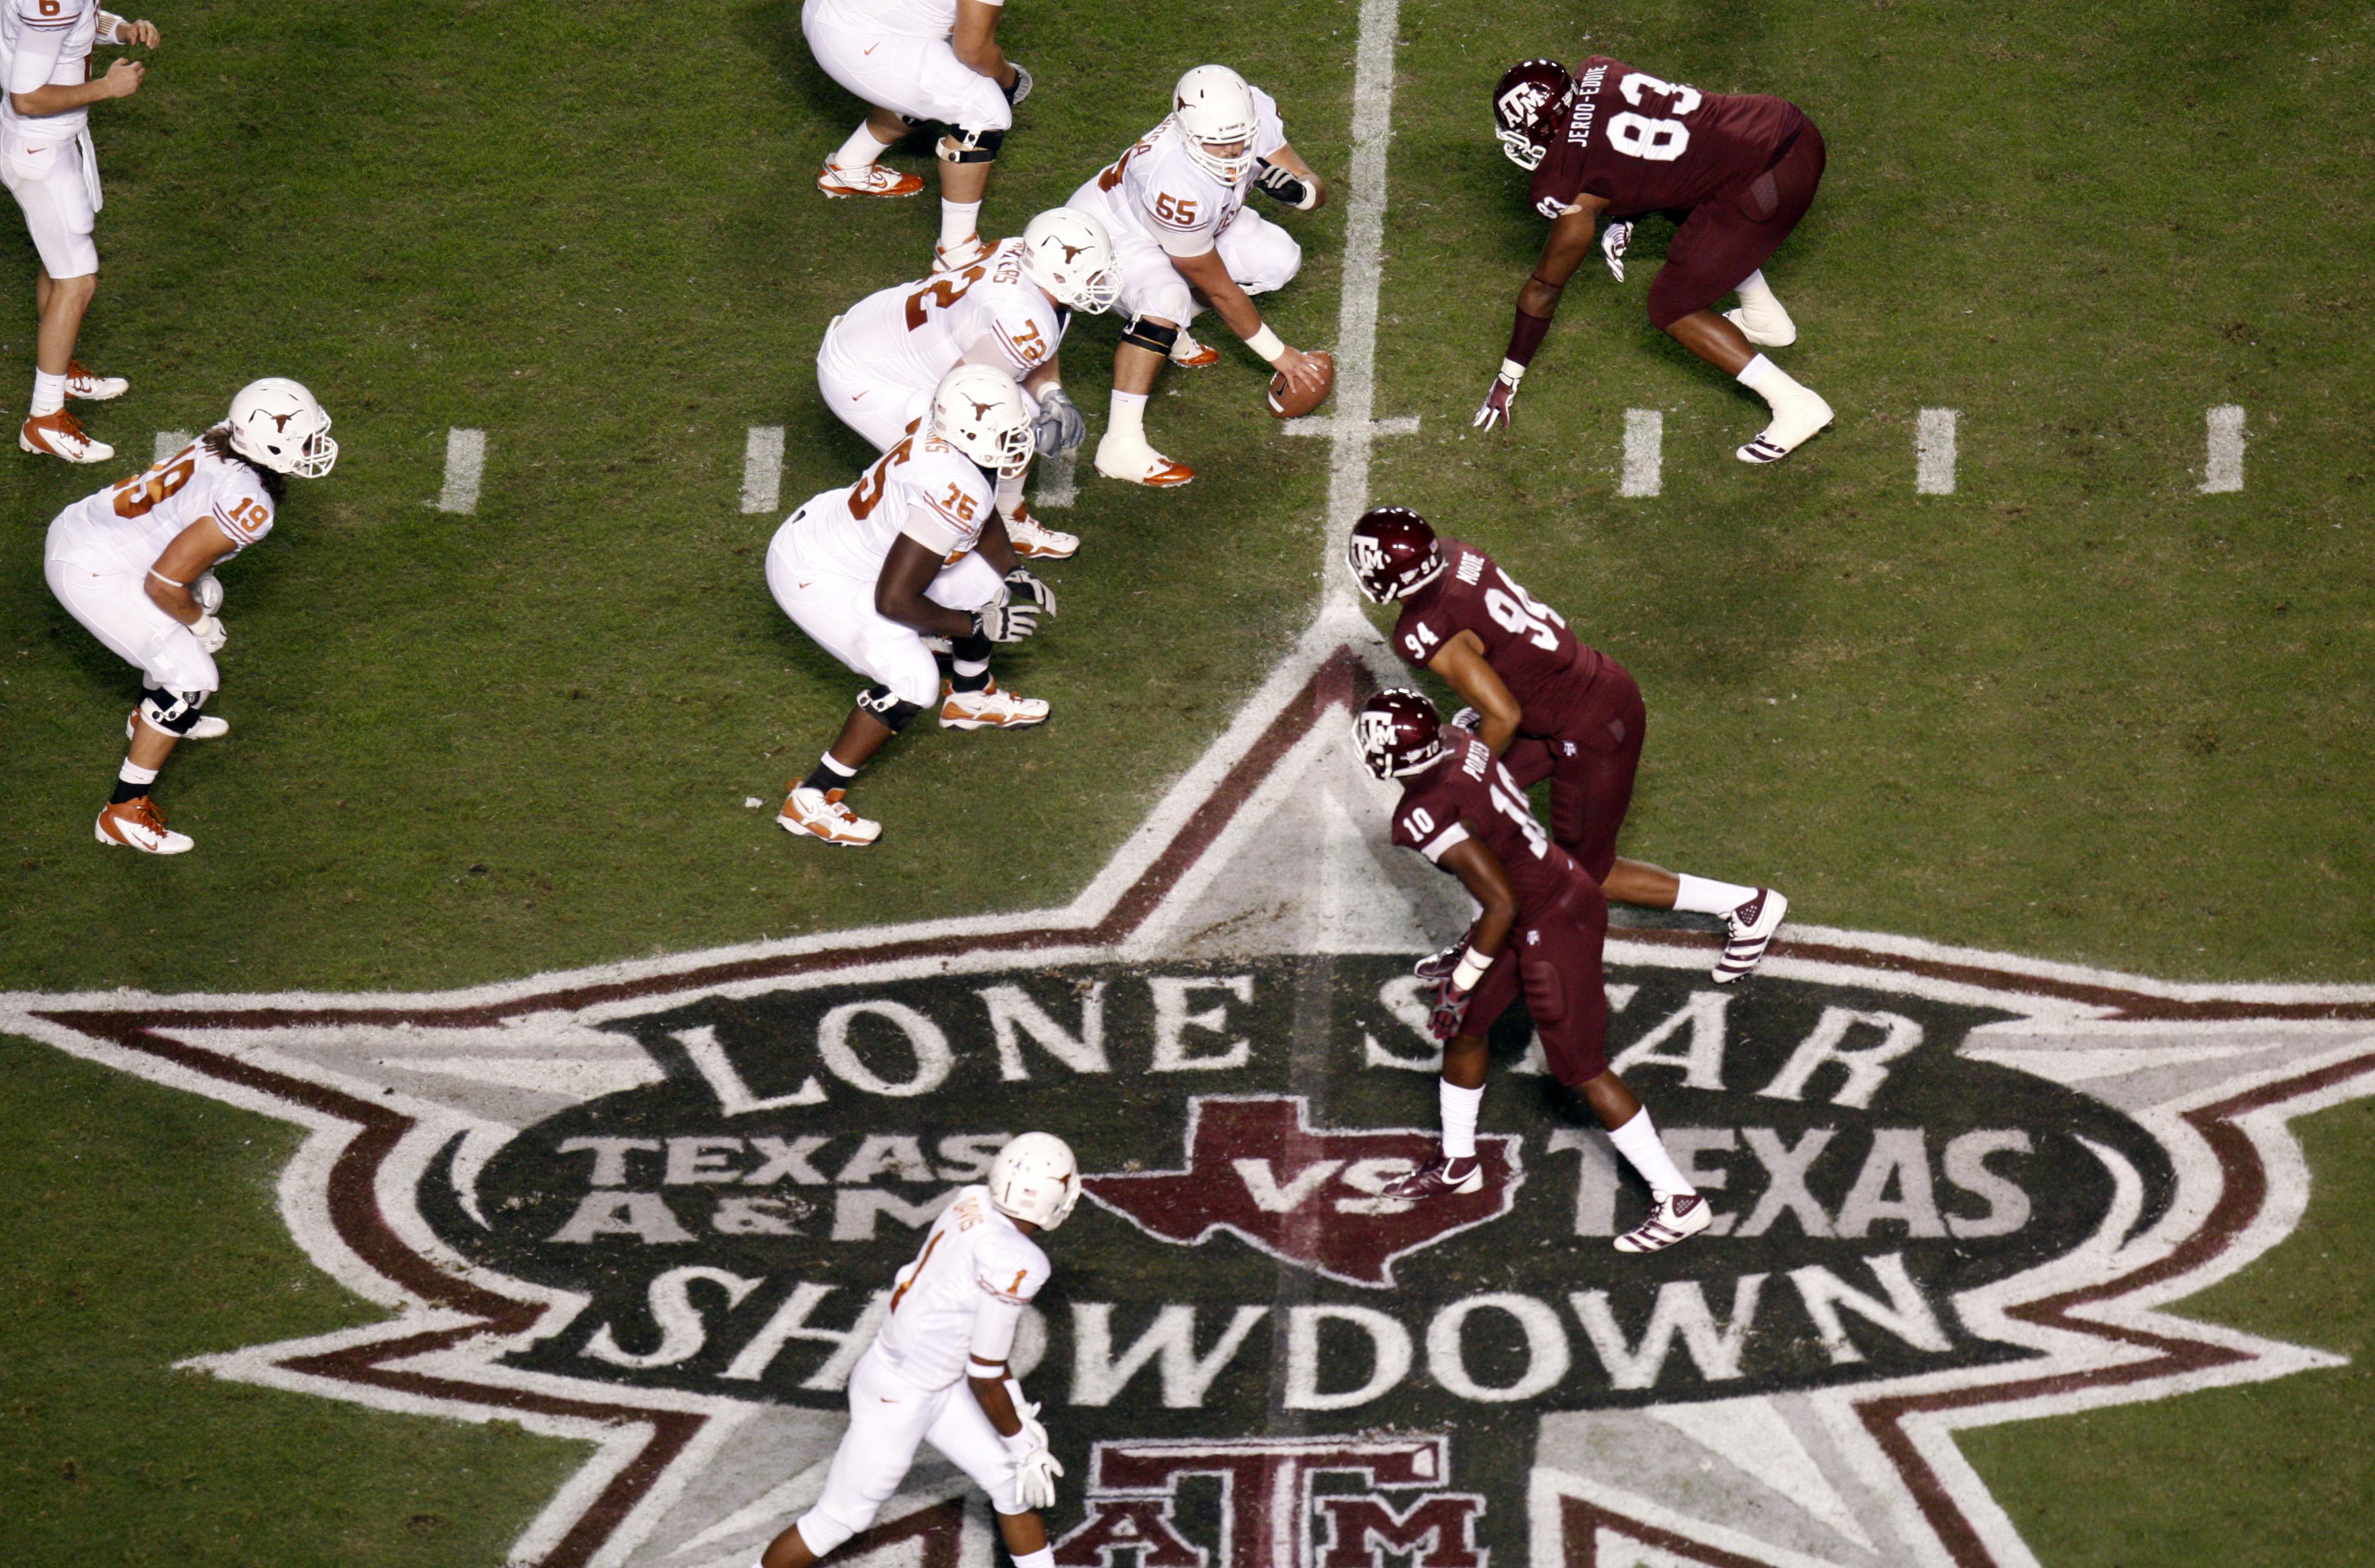 8c67f6666f2 Texas Gov. Greg Abbott pushes revival of the Longhorns vs. Aggies football  rivalry